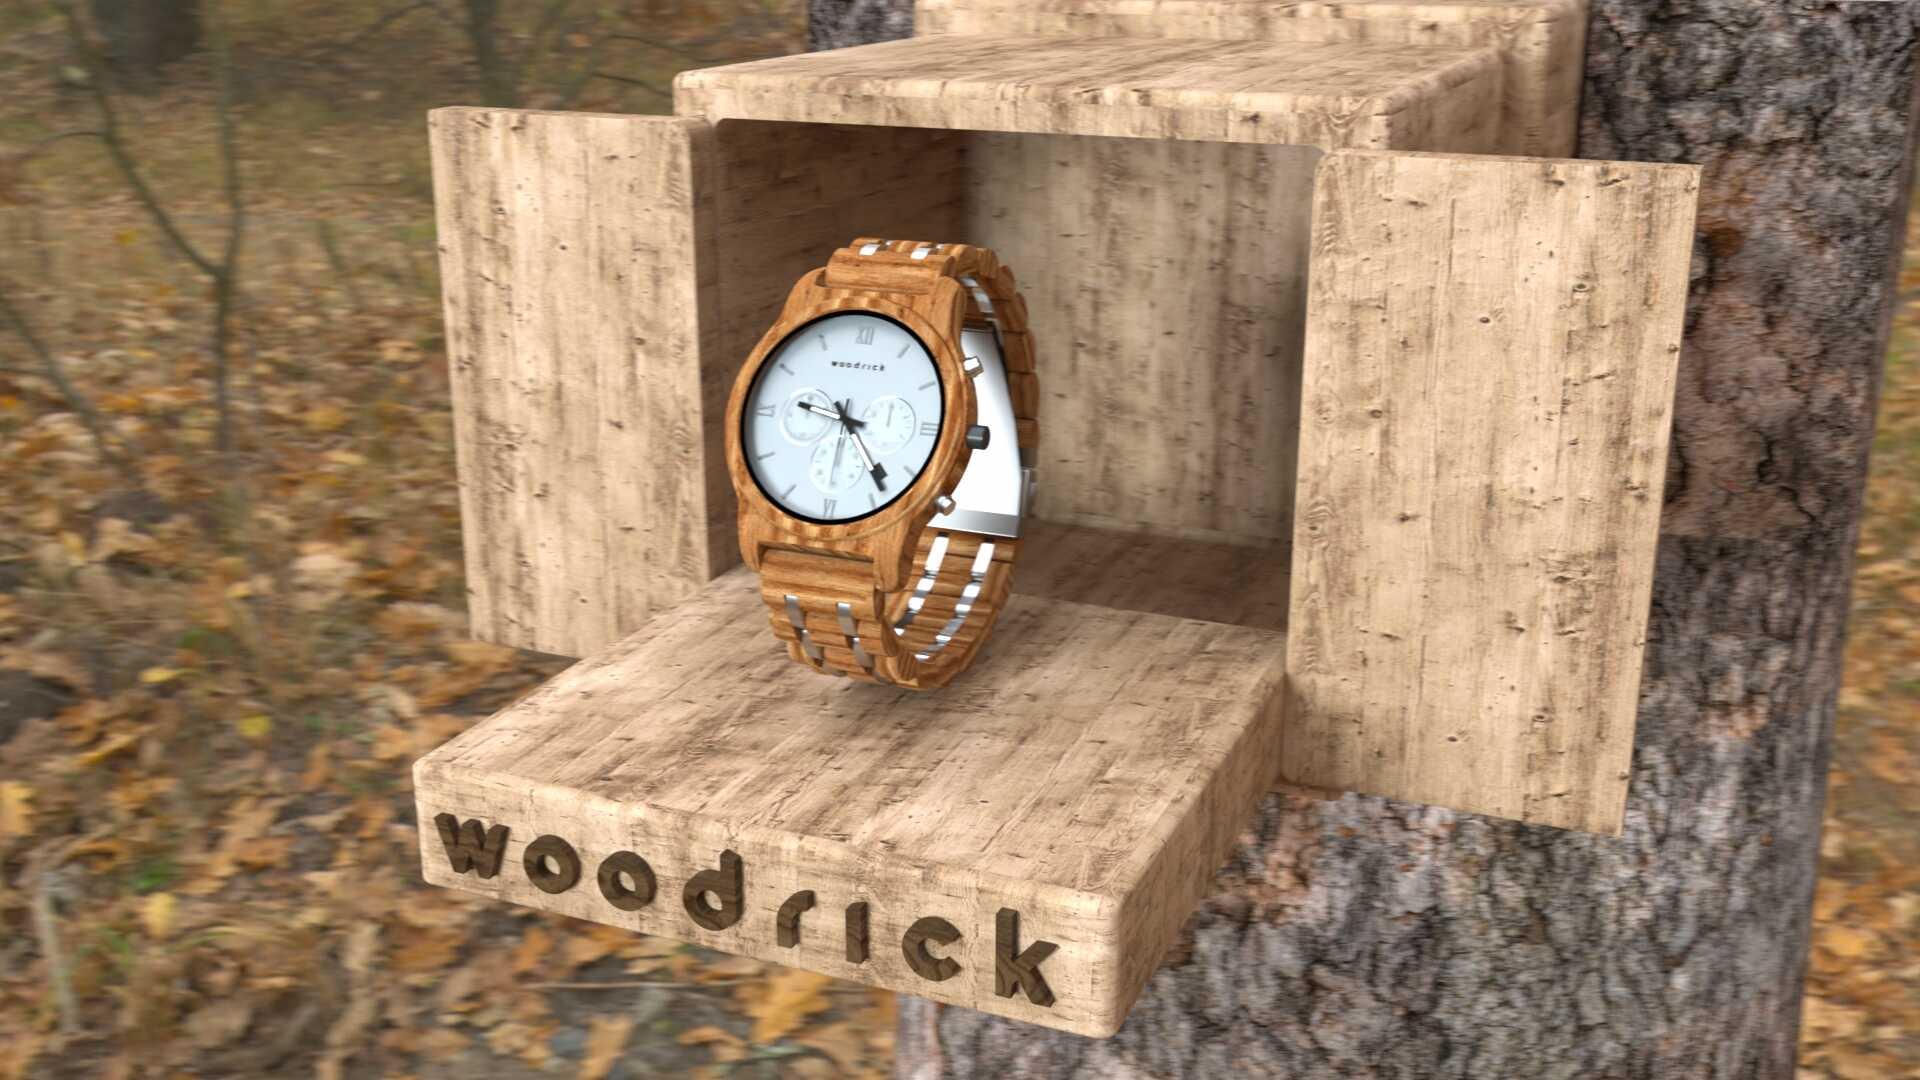 Woodrick